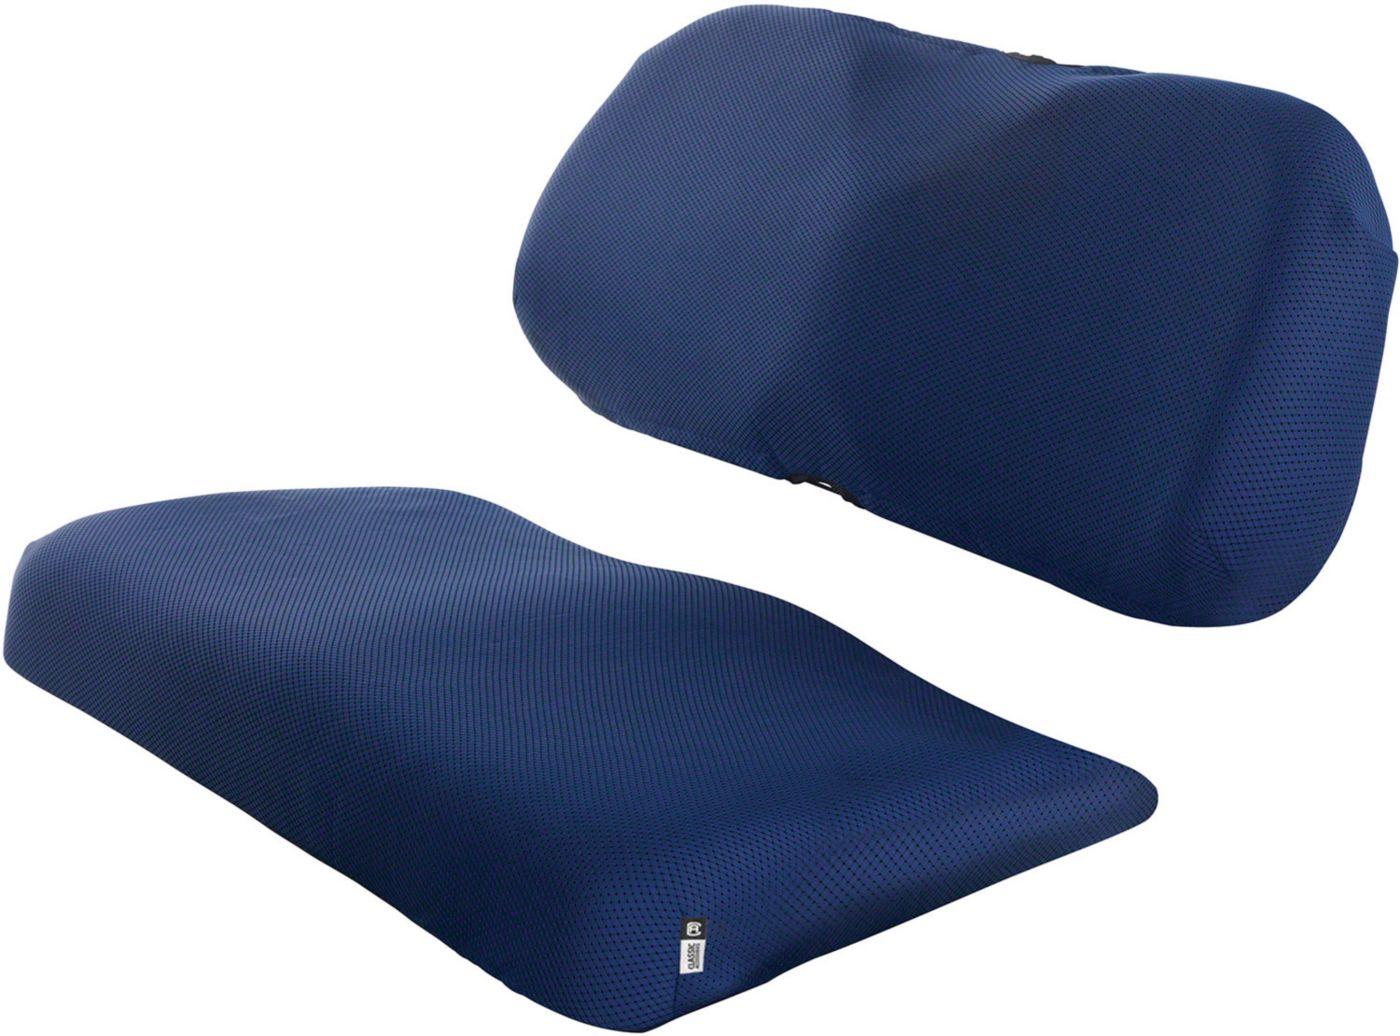 Classic Accessories Fairway Navy Diamond Air Mesh Seat Cover